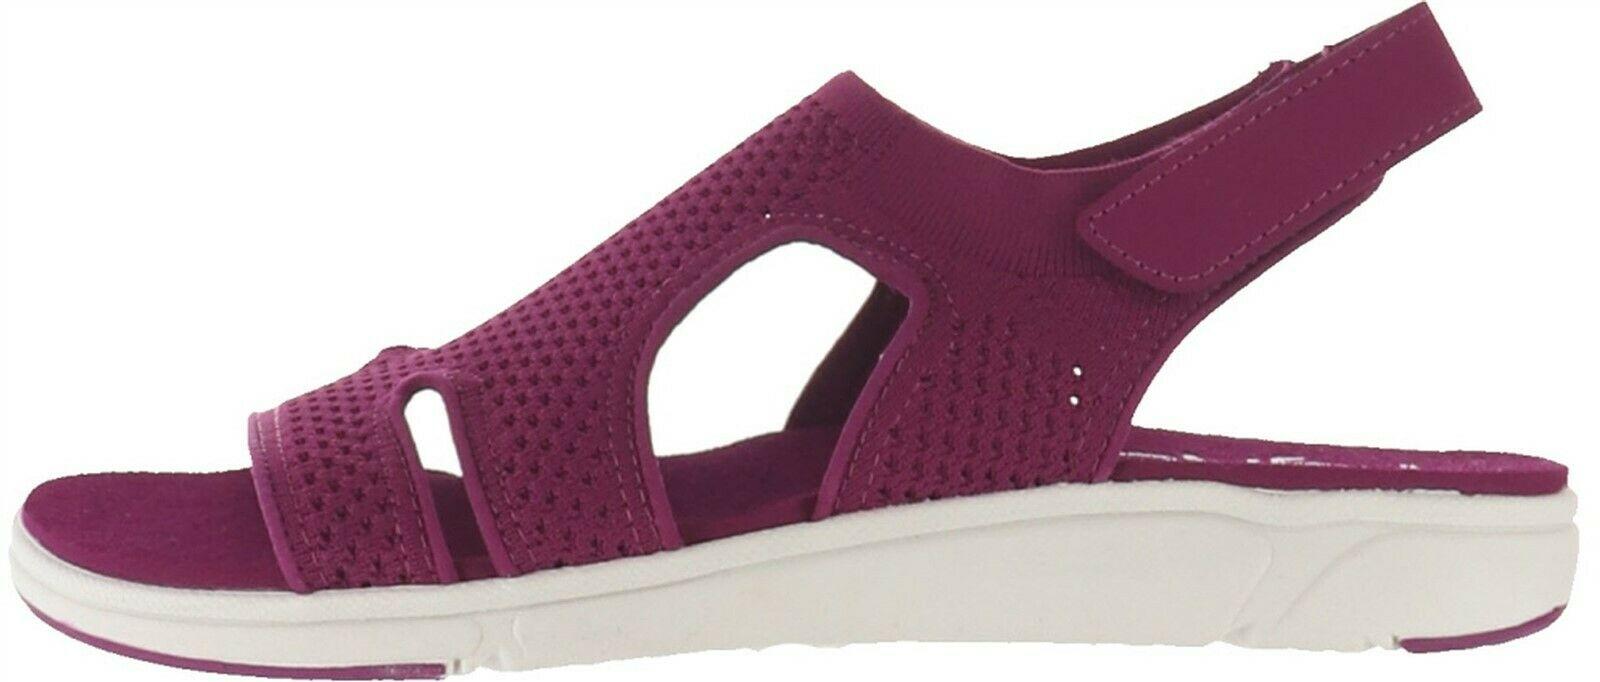 Ryka Stretch Knit Sport Sandals Micha